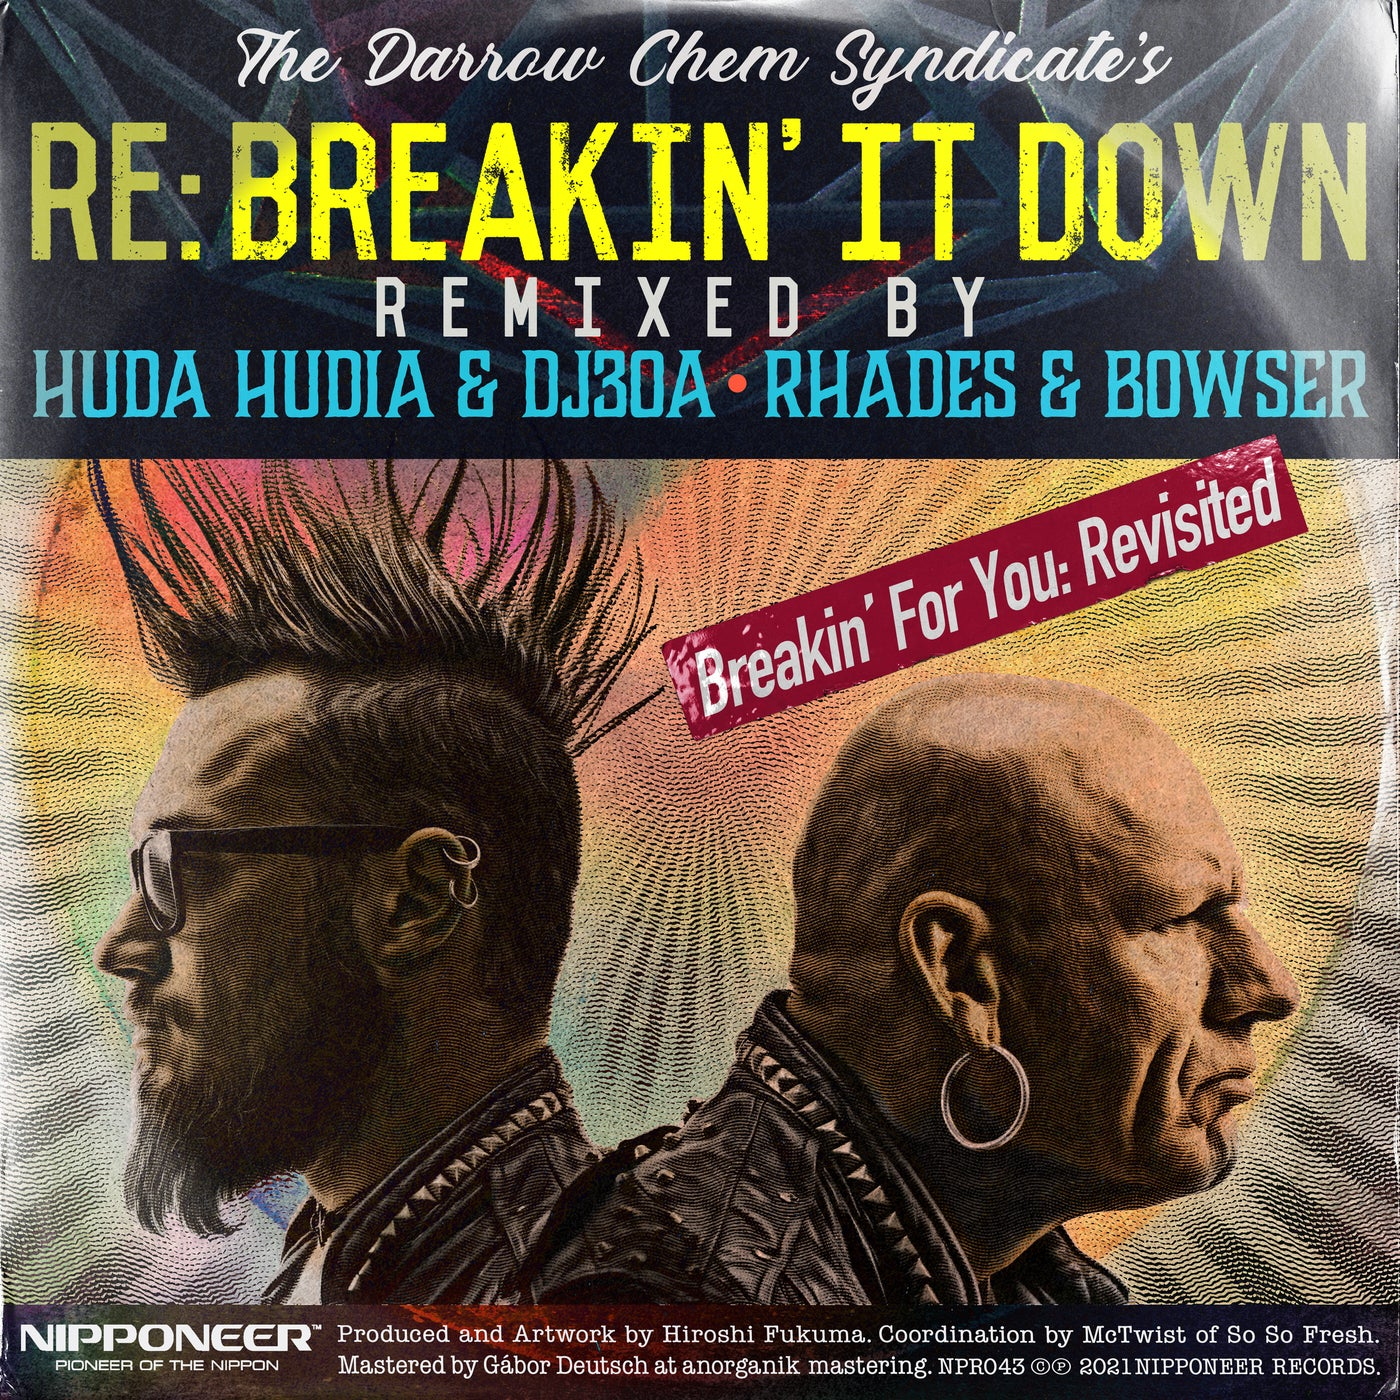 Re: Breakin' It Down (Rhades & Bowser vs Kuplay Remix)